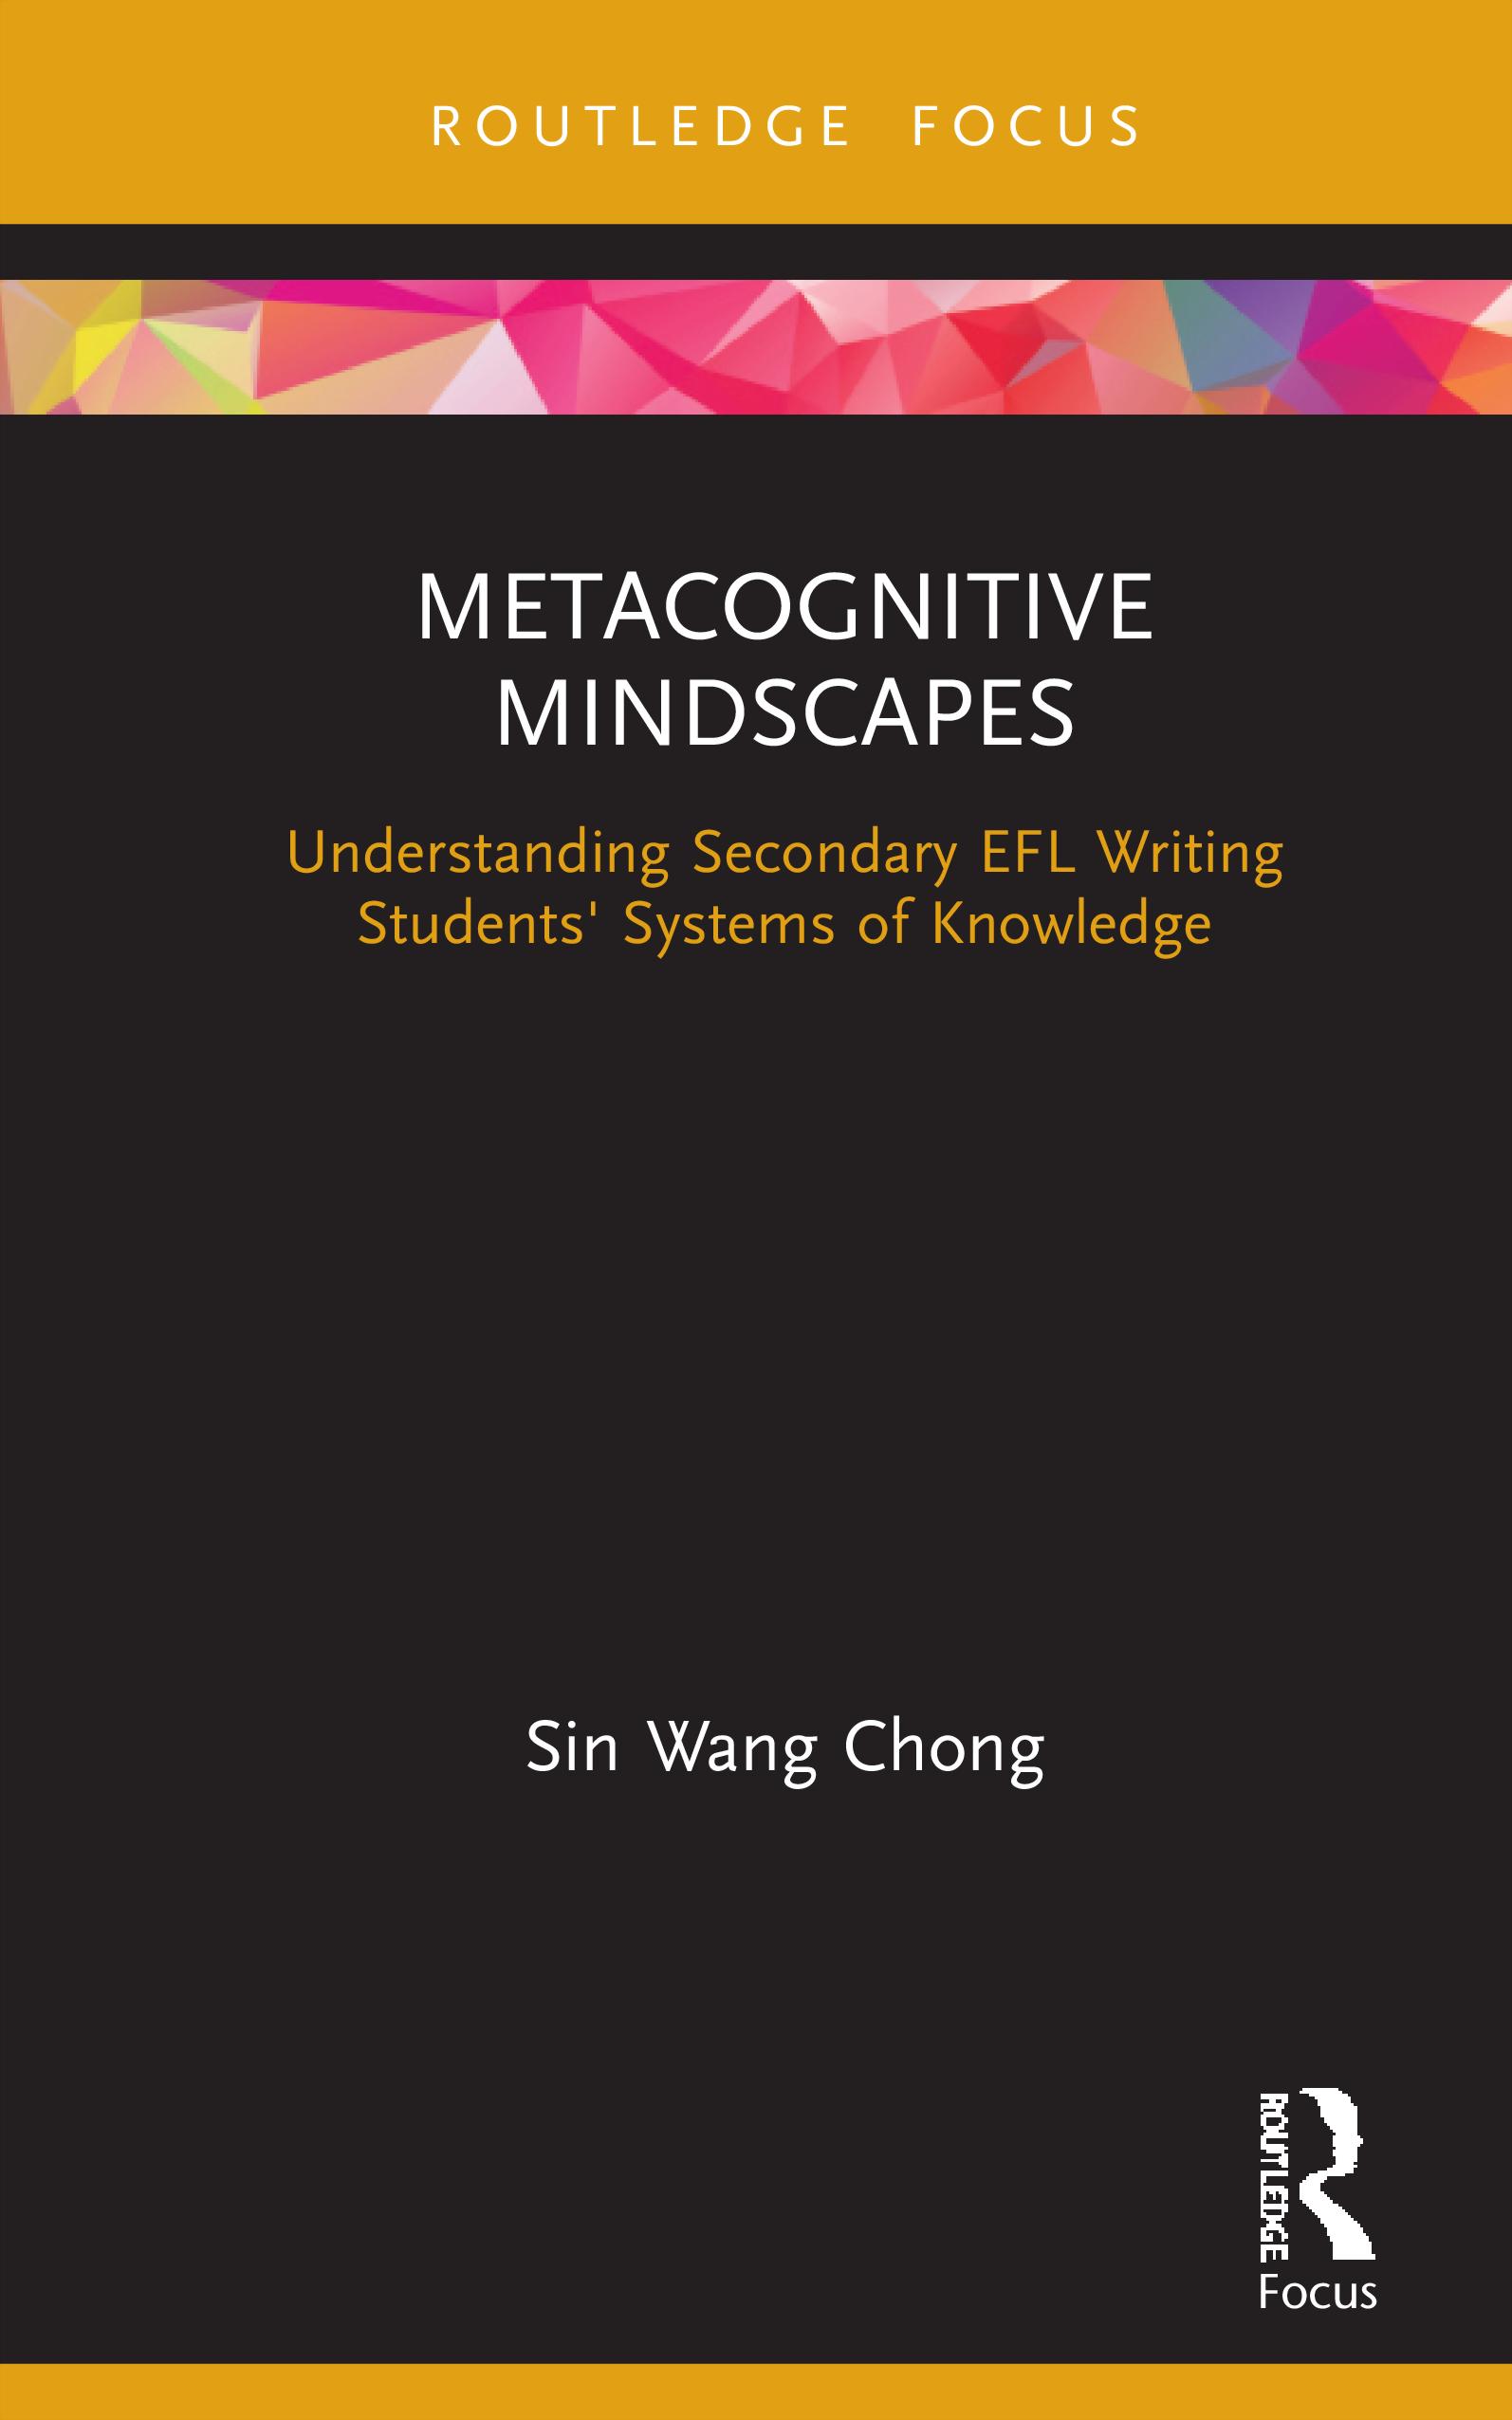 Metacognitive Mindscapes